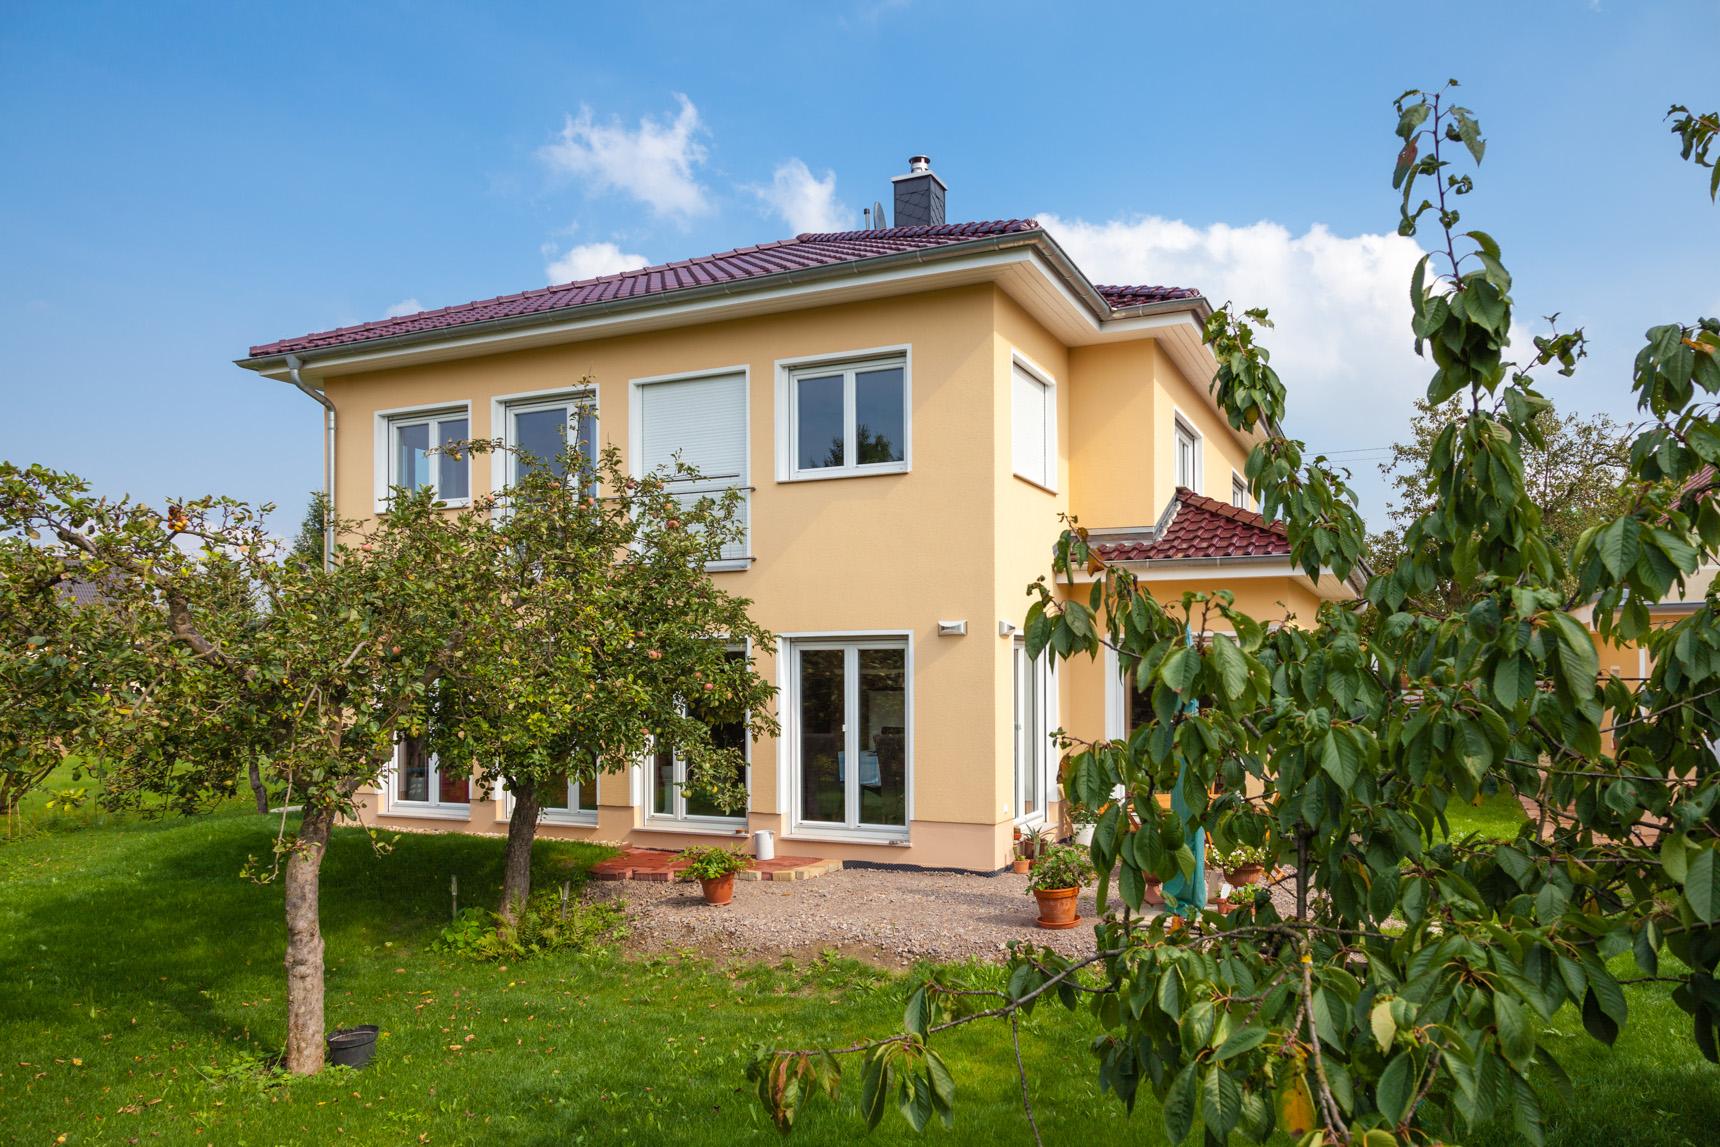 Referenz - Holzhausen - AGL Massivhaus Projektbau GmbH